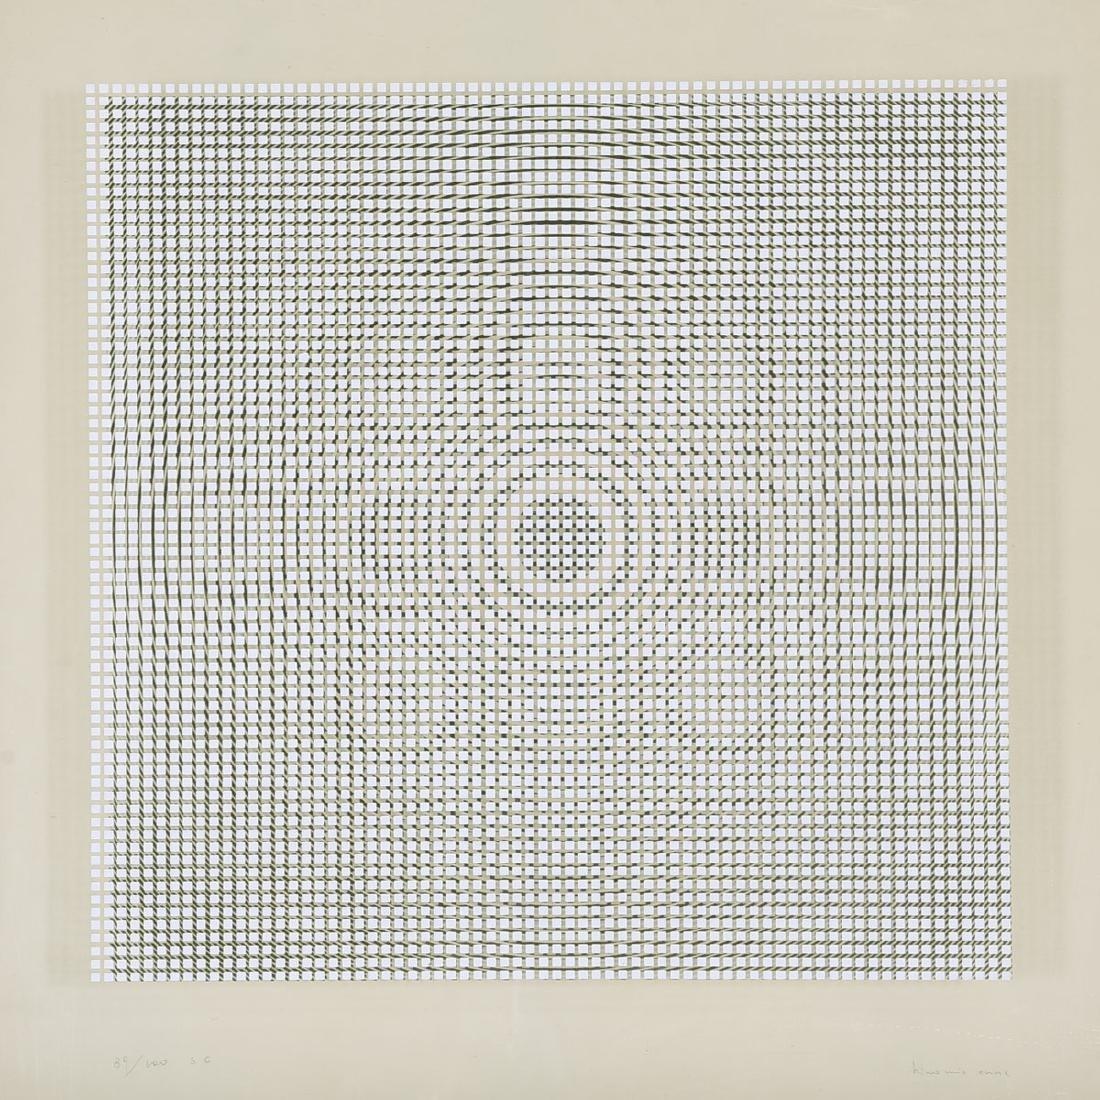 Attrib. to Alberto Biasi, Untitled double silkscreen